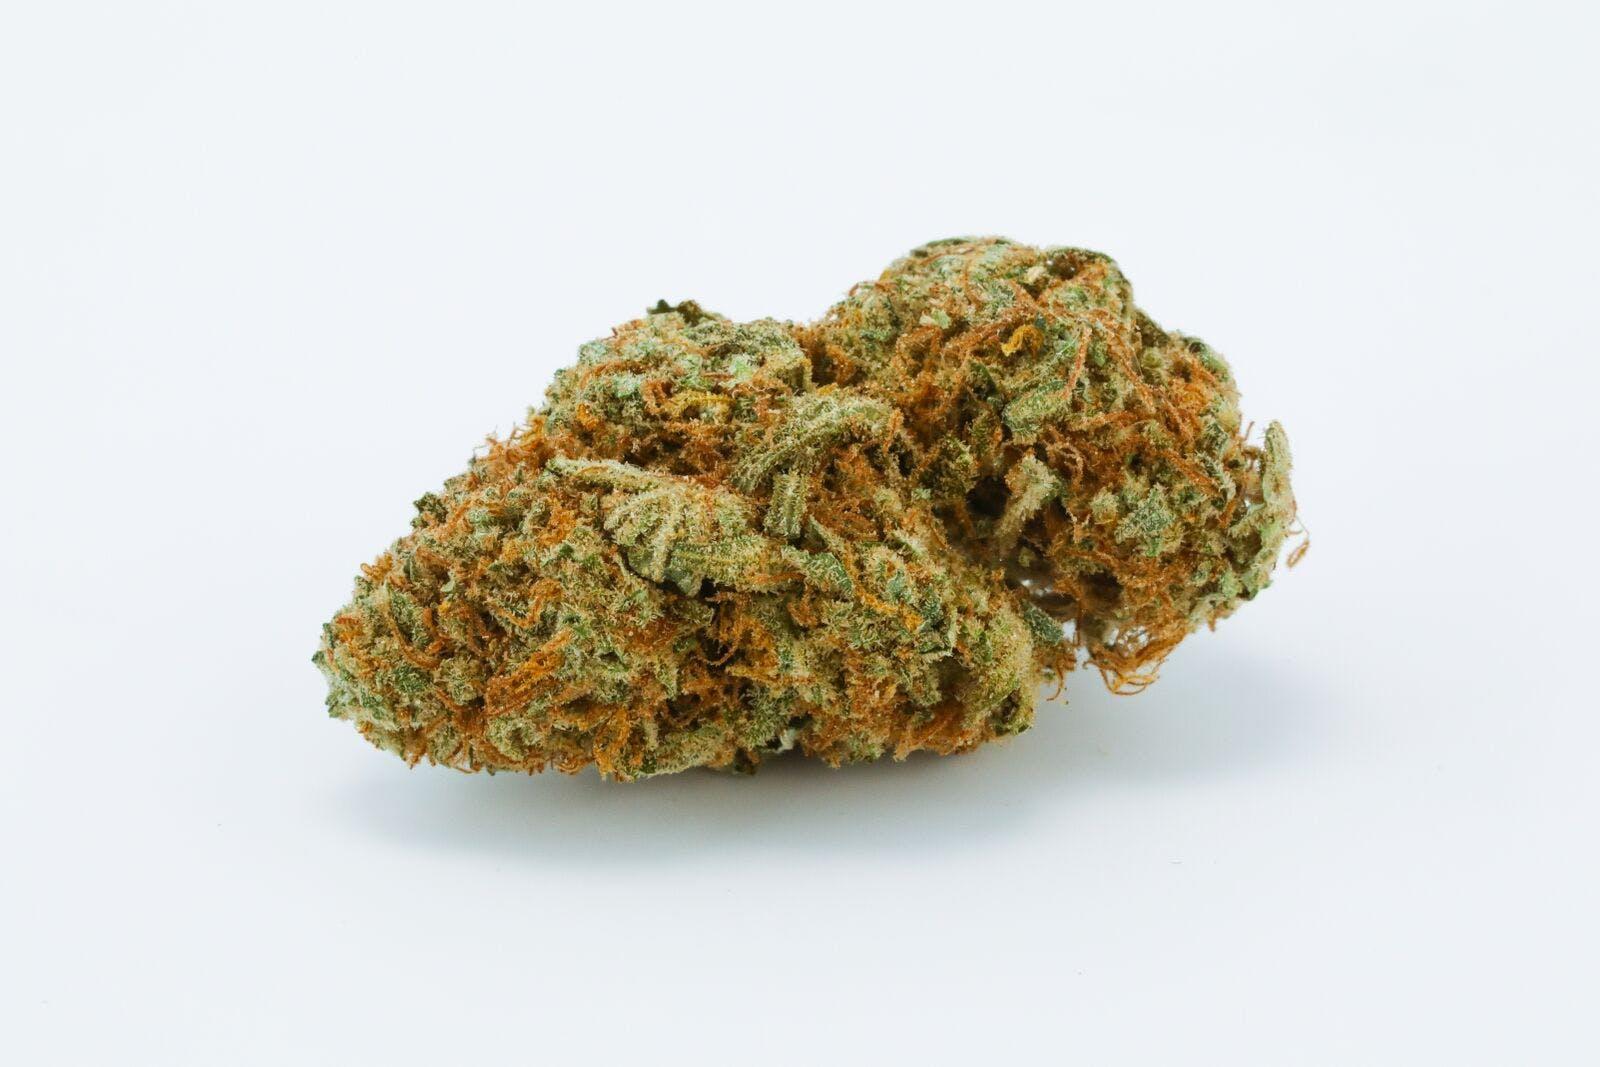 White Gold Weed; White Gold Cannabis Strain; White Gold Hybrid Marijuana Strain